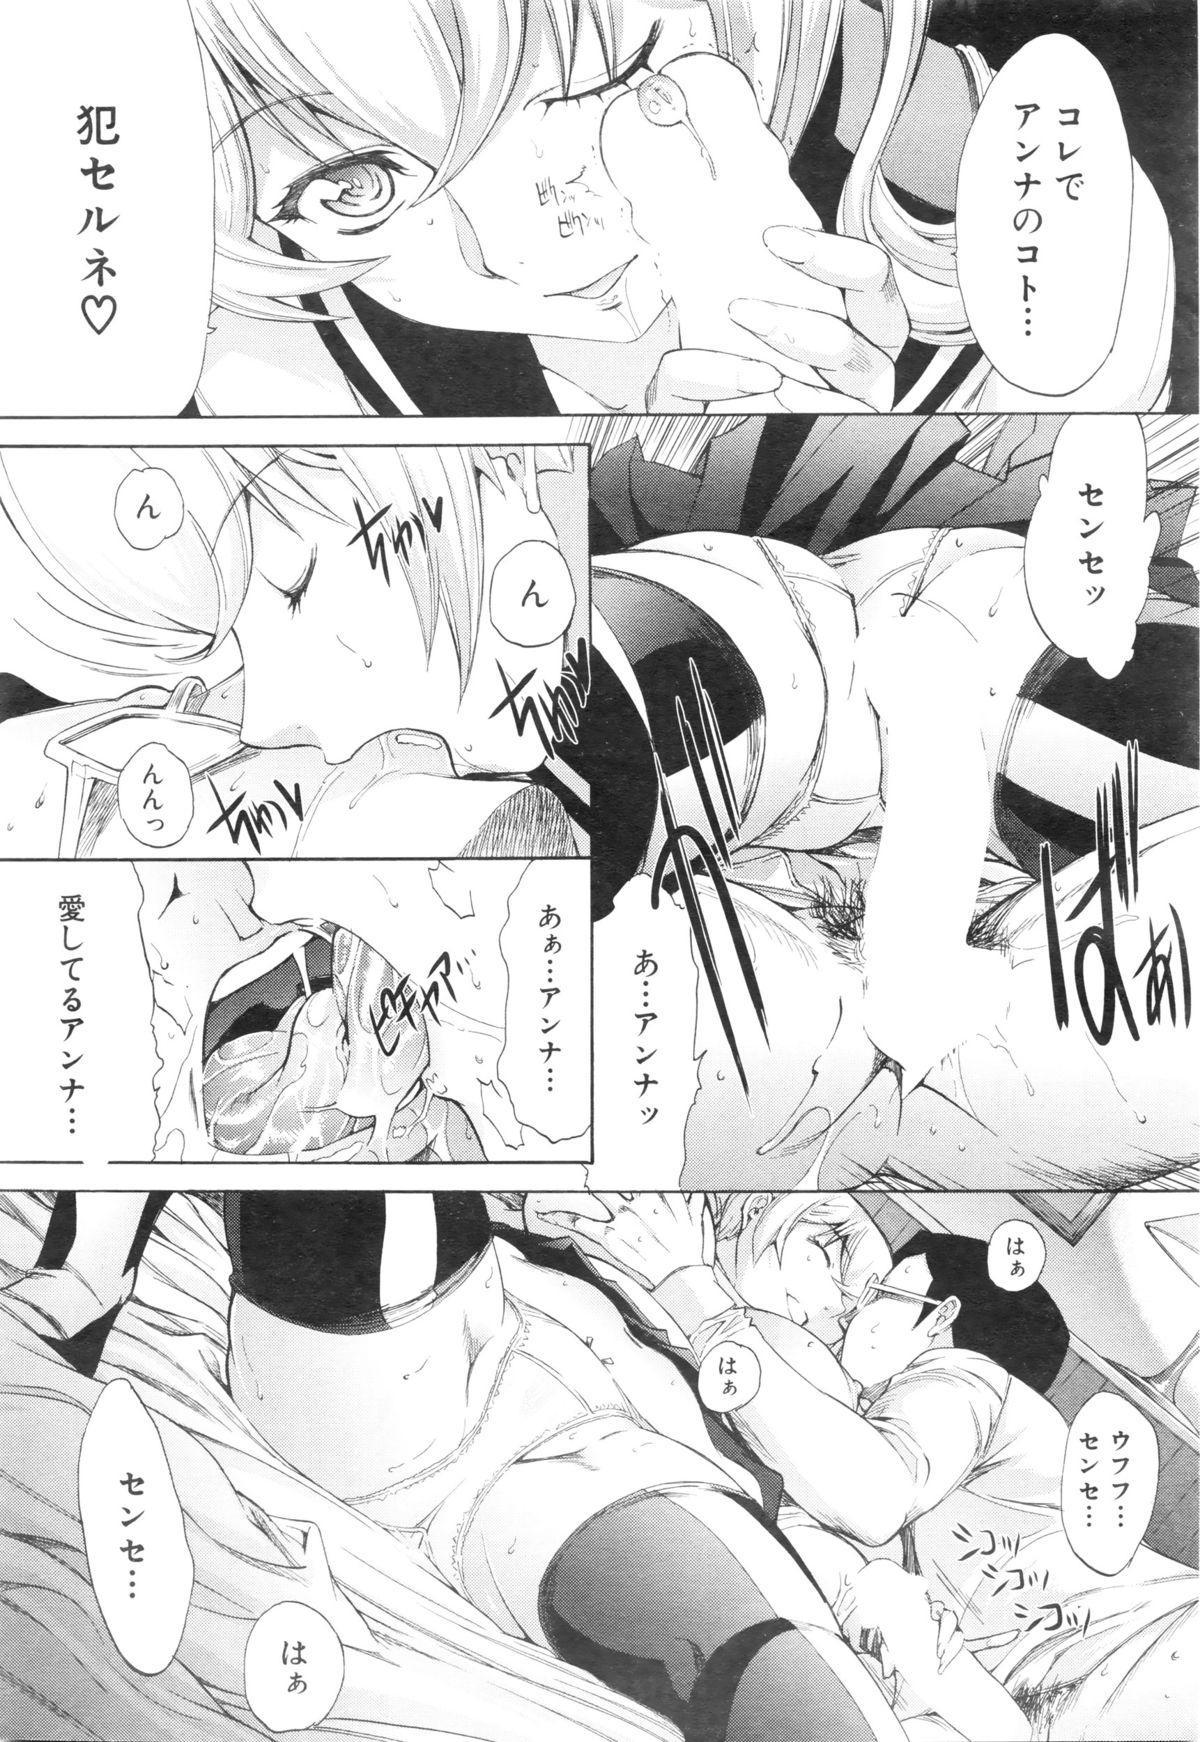 COMIC Mugen Tensei 2016-01 13